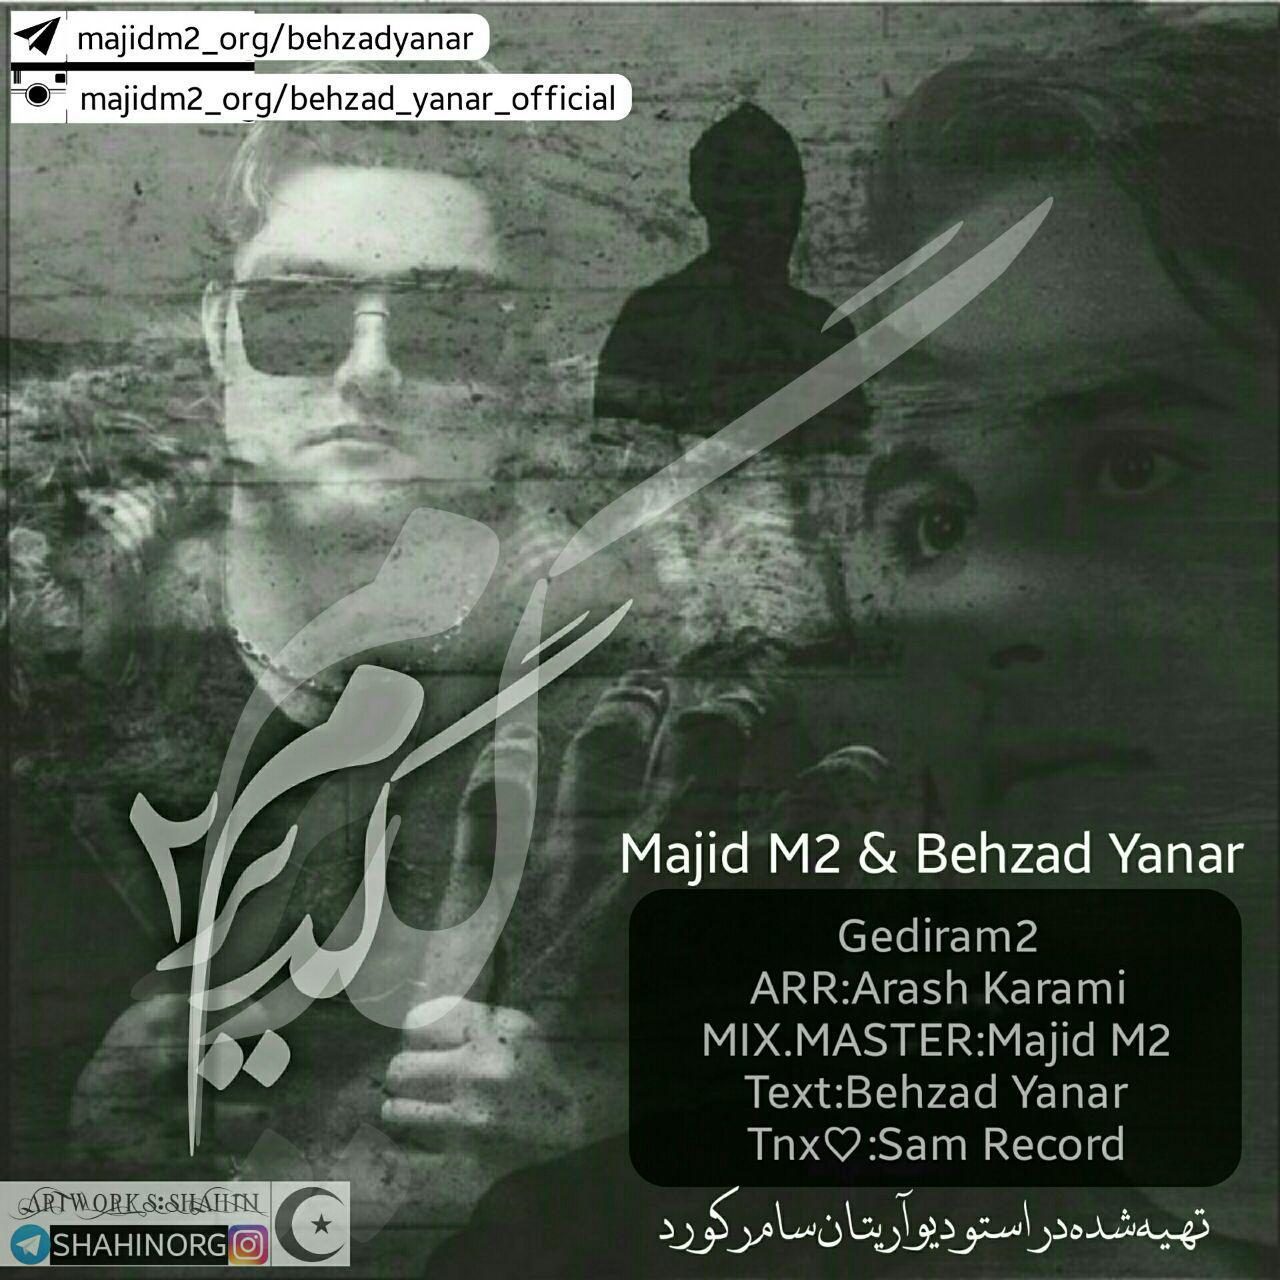 http://s9.picofile.com/file/8320064034/24Majid_M2_Behzad_Yanar_Gediram_2.jpg